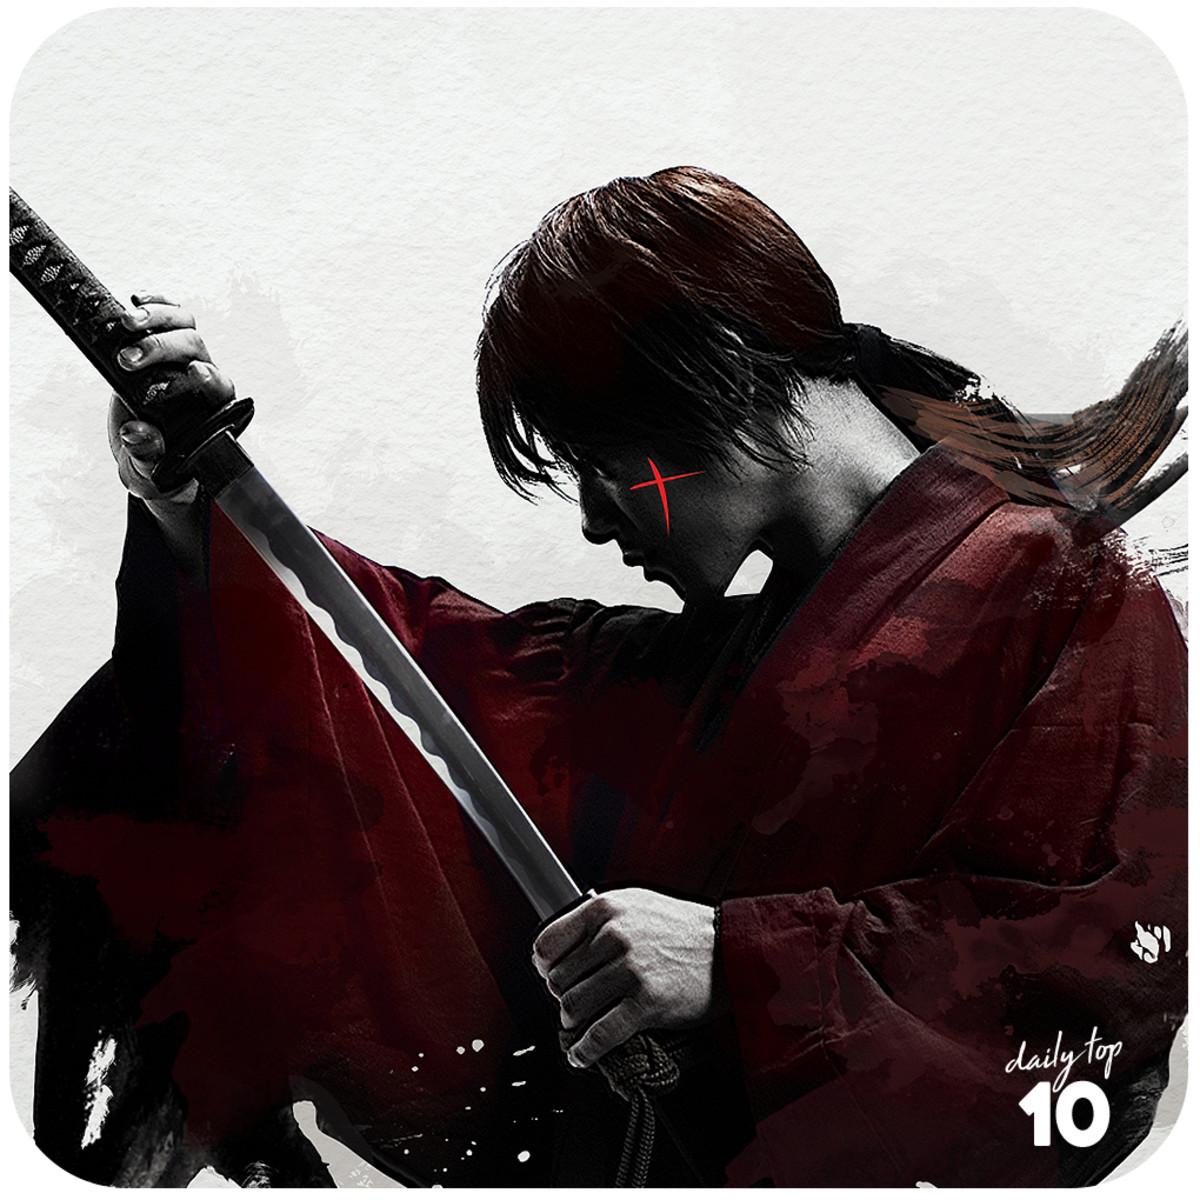 Rorouni Kenshin live-action adaptation